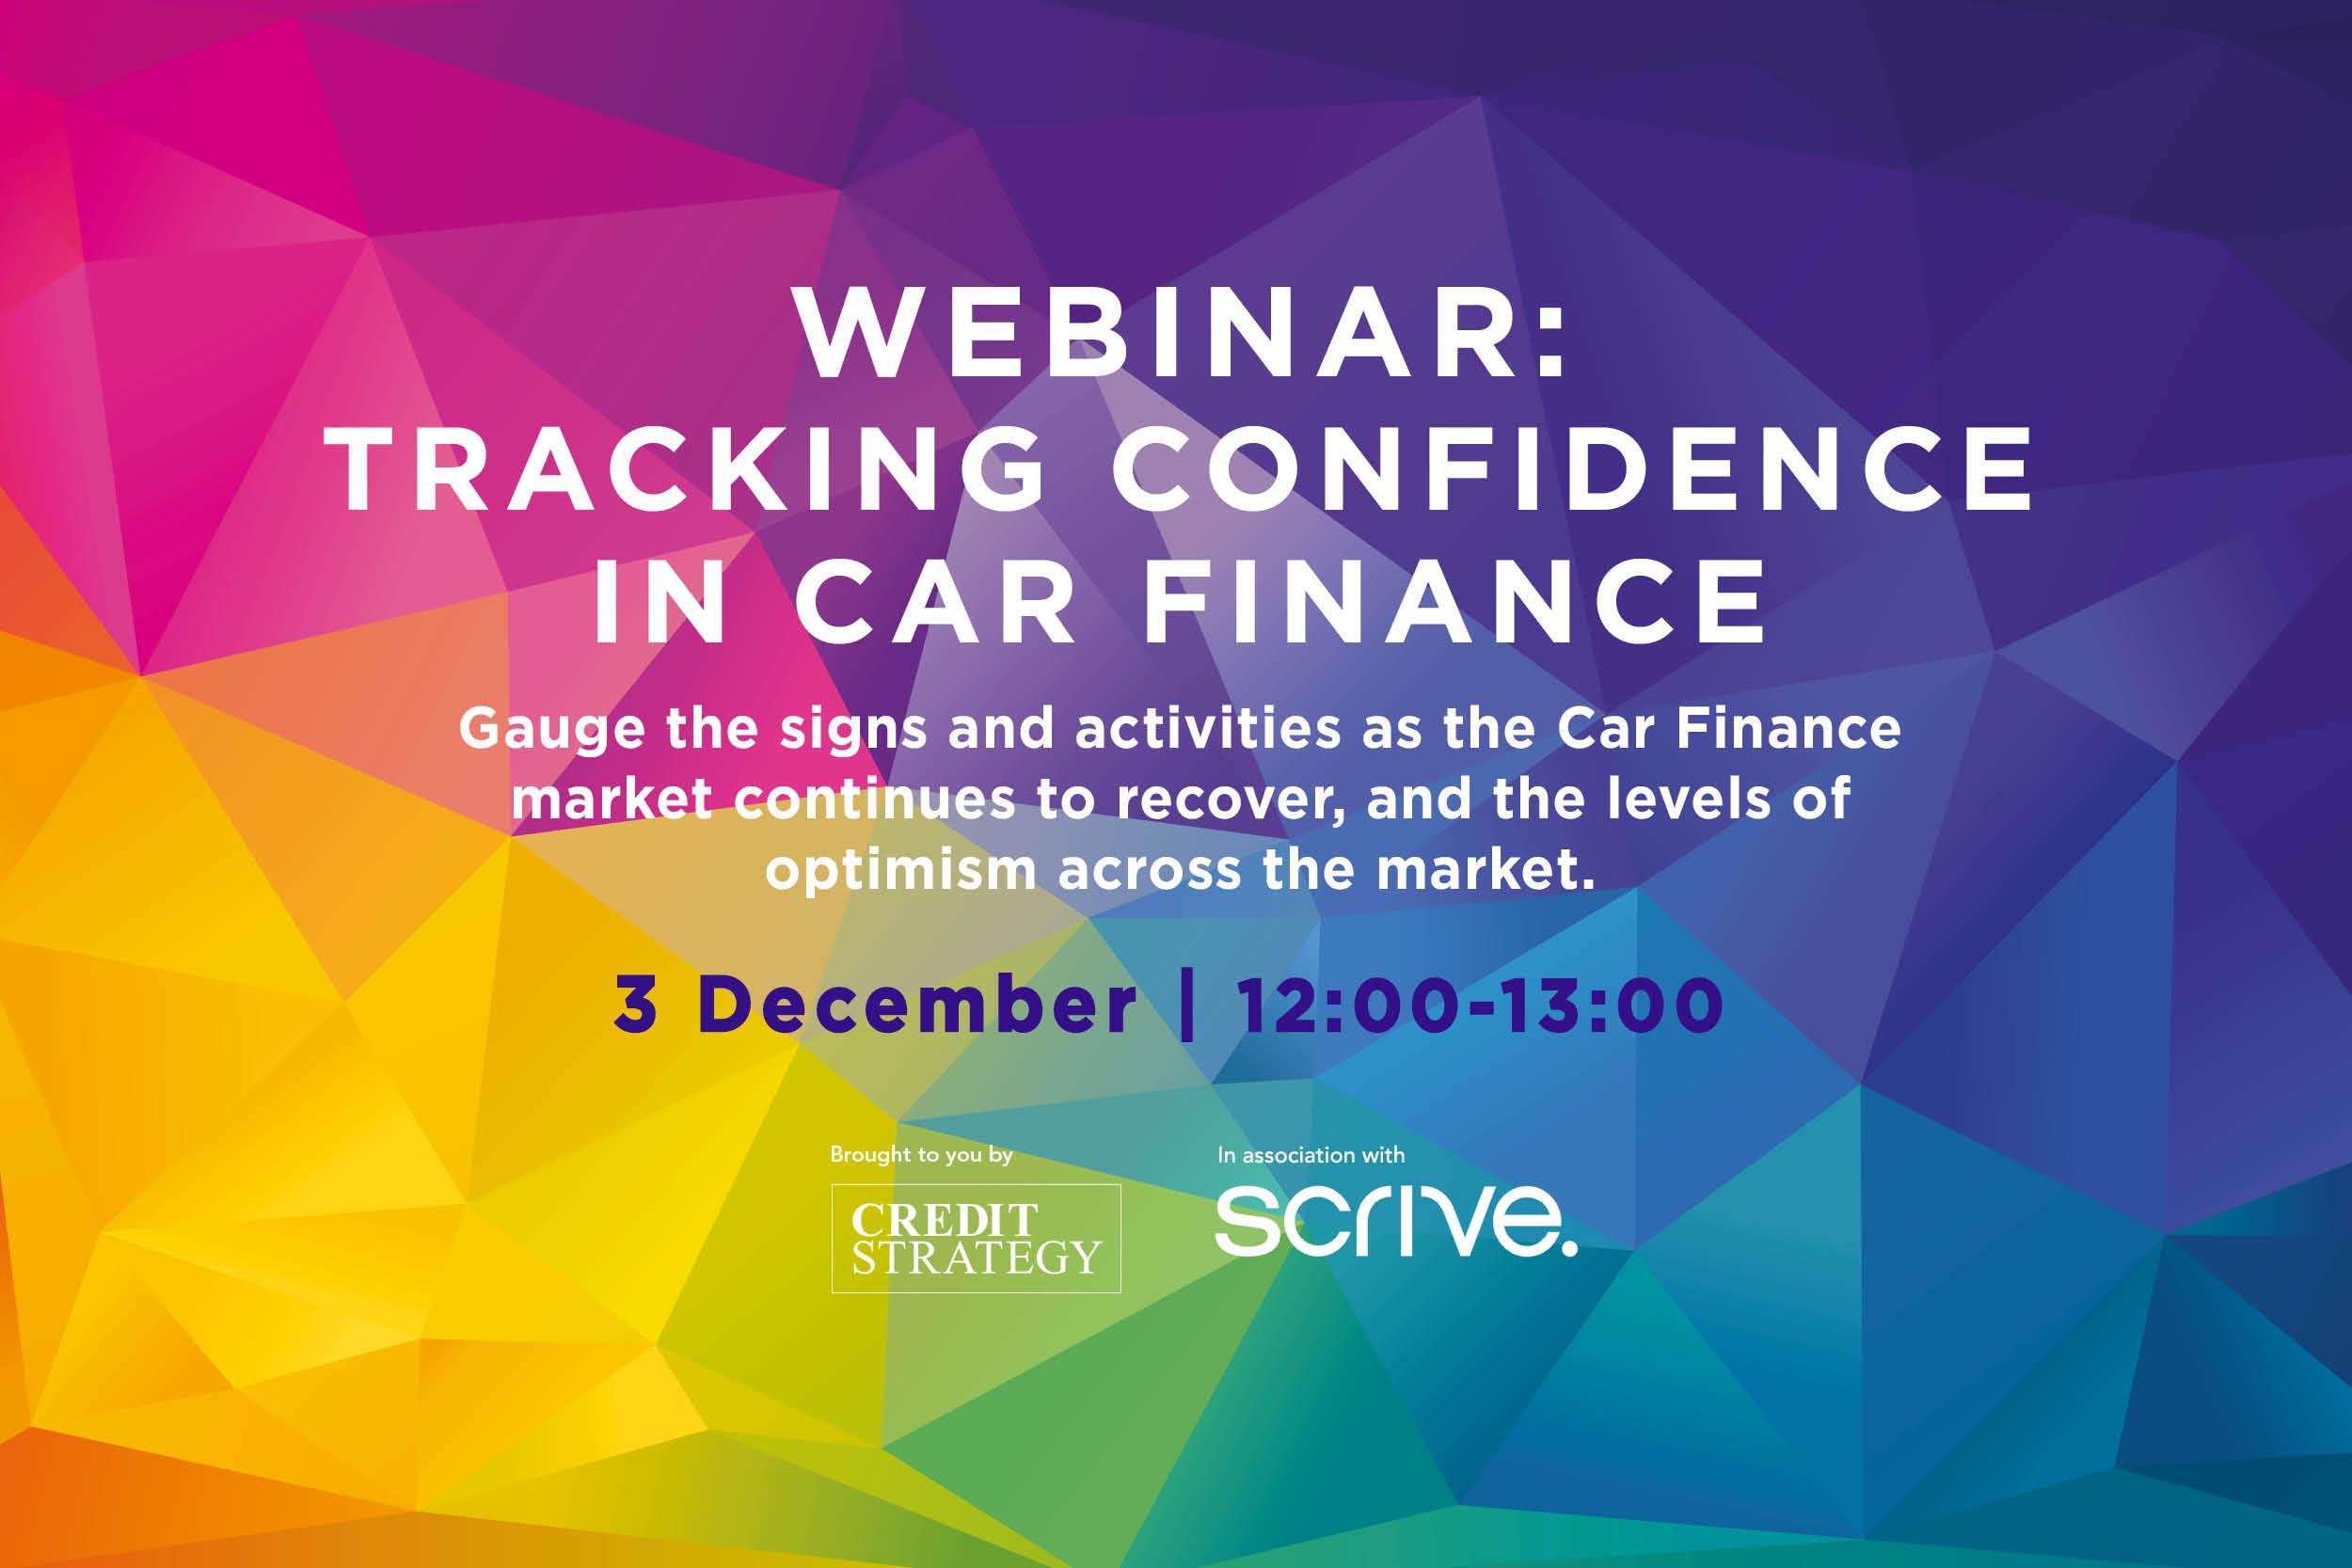 Tracking confidence in Car Finance webinar